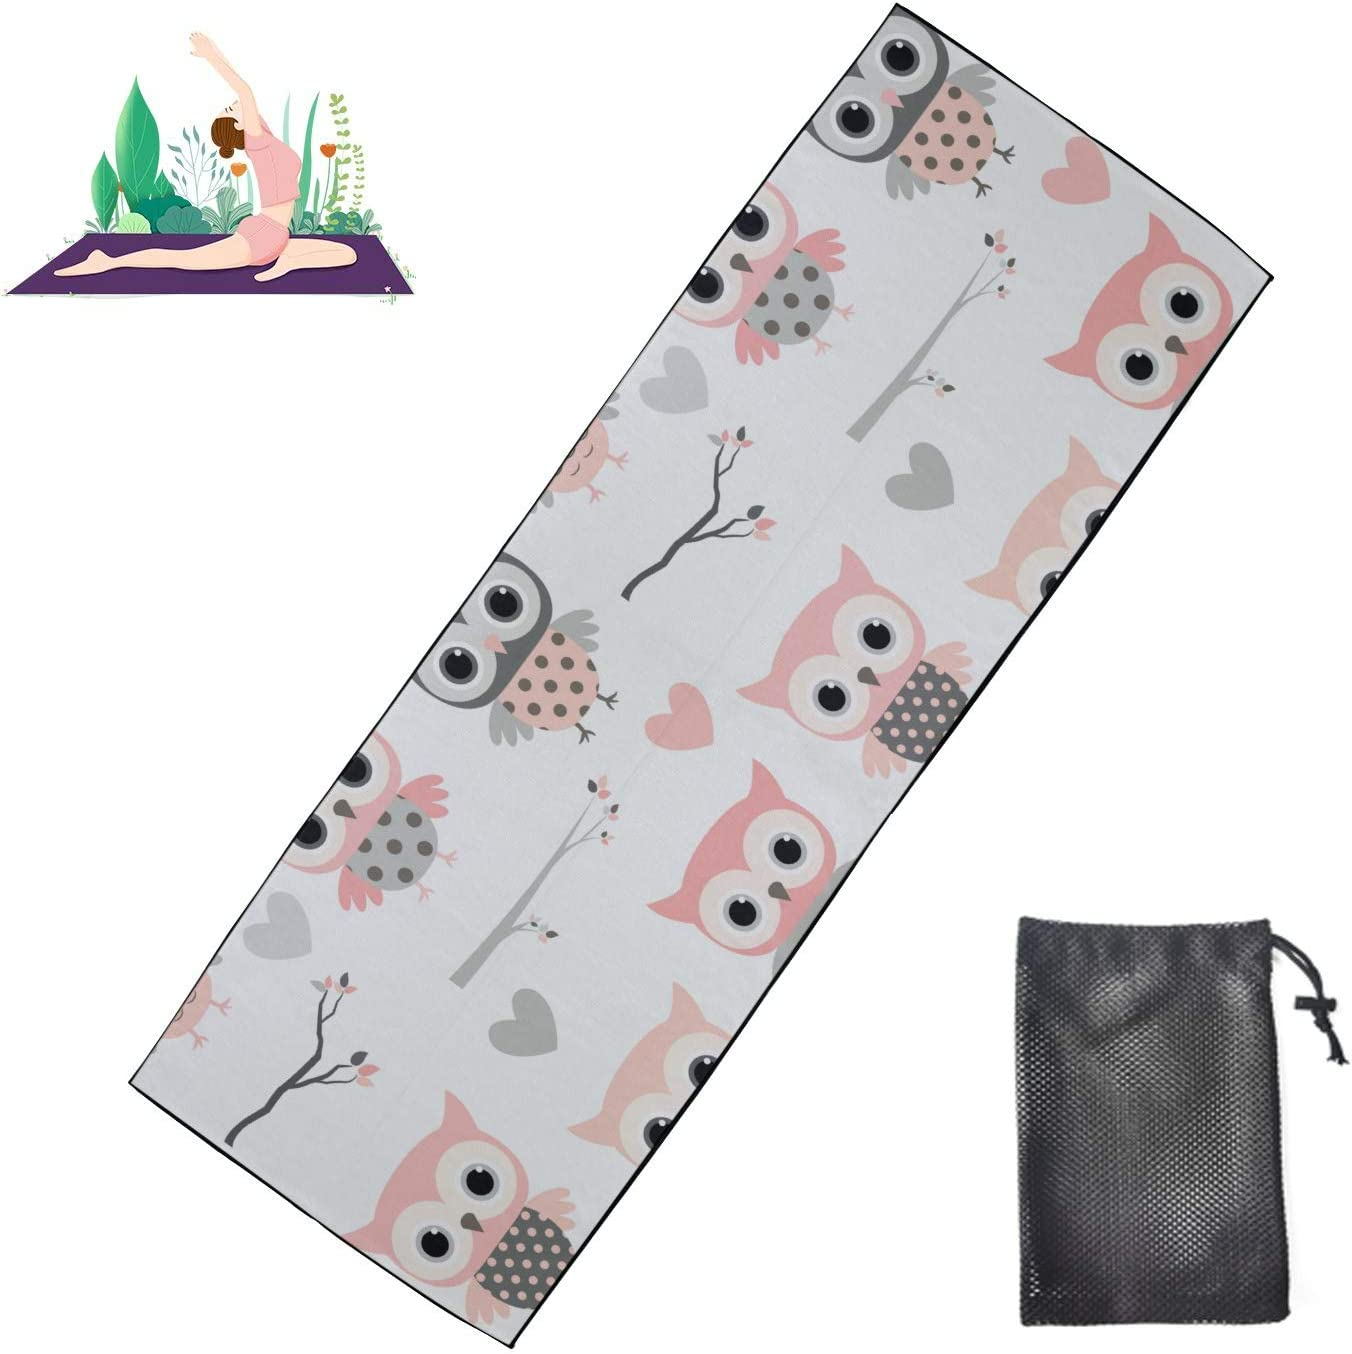 Huqalh Yoga Spring new work Gym Mat Cute Cartoon Owls S Girl Microfiber OFFicial store